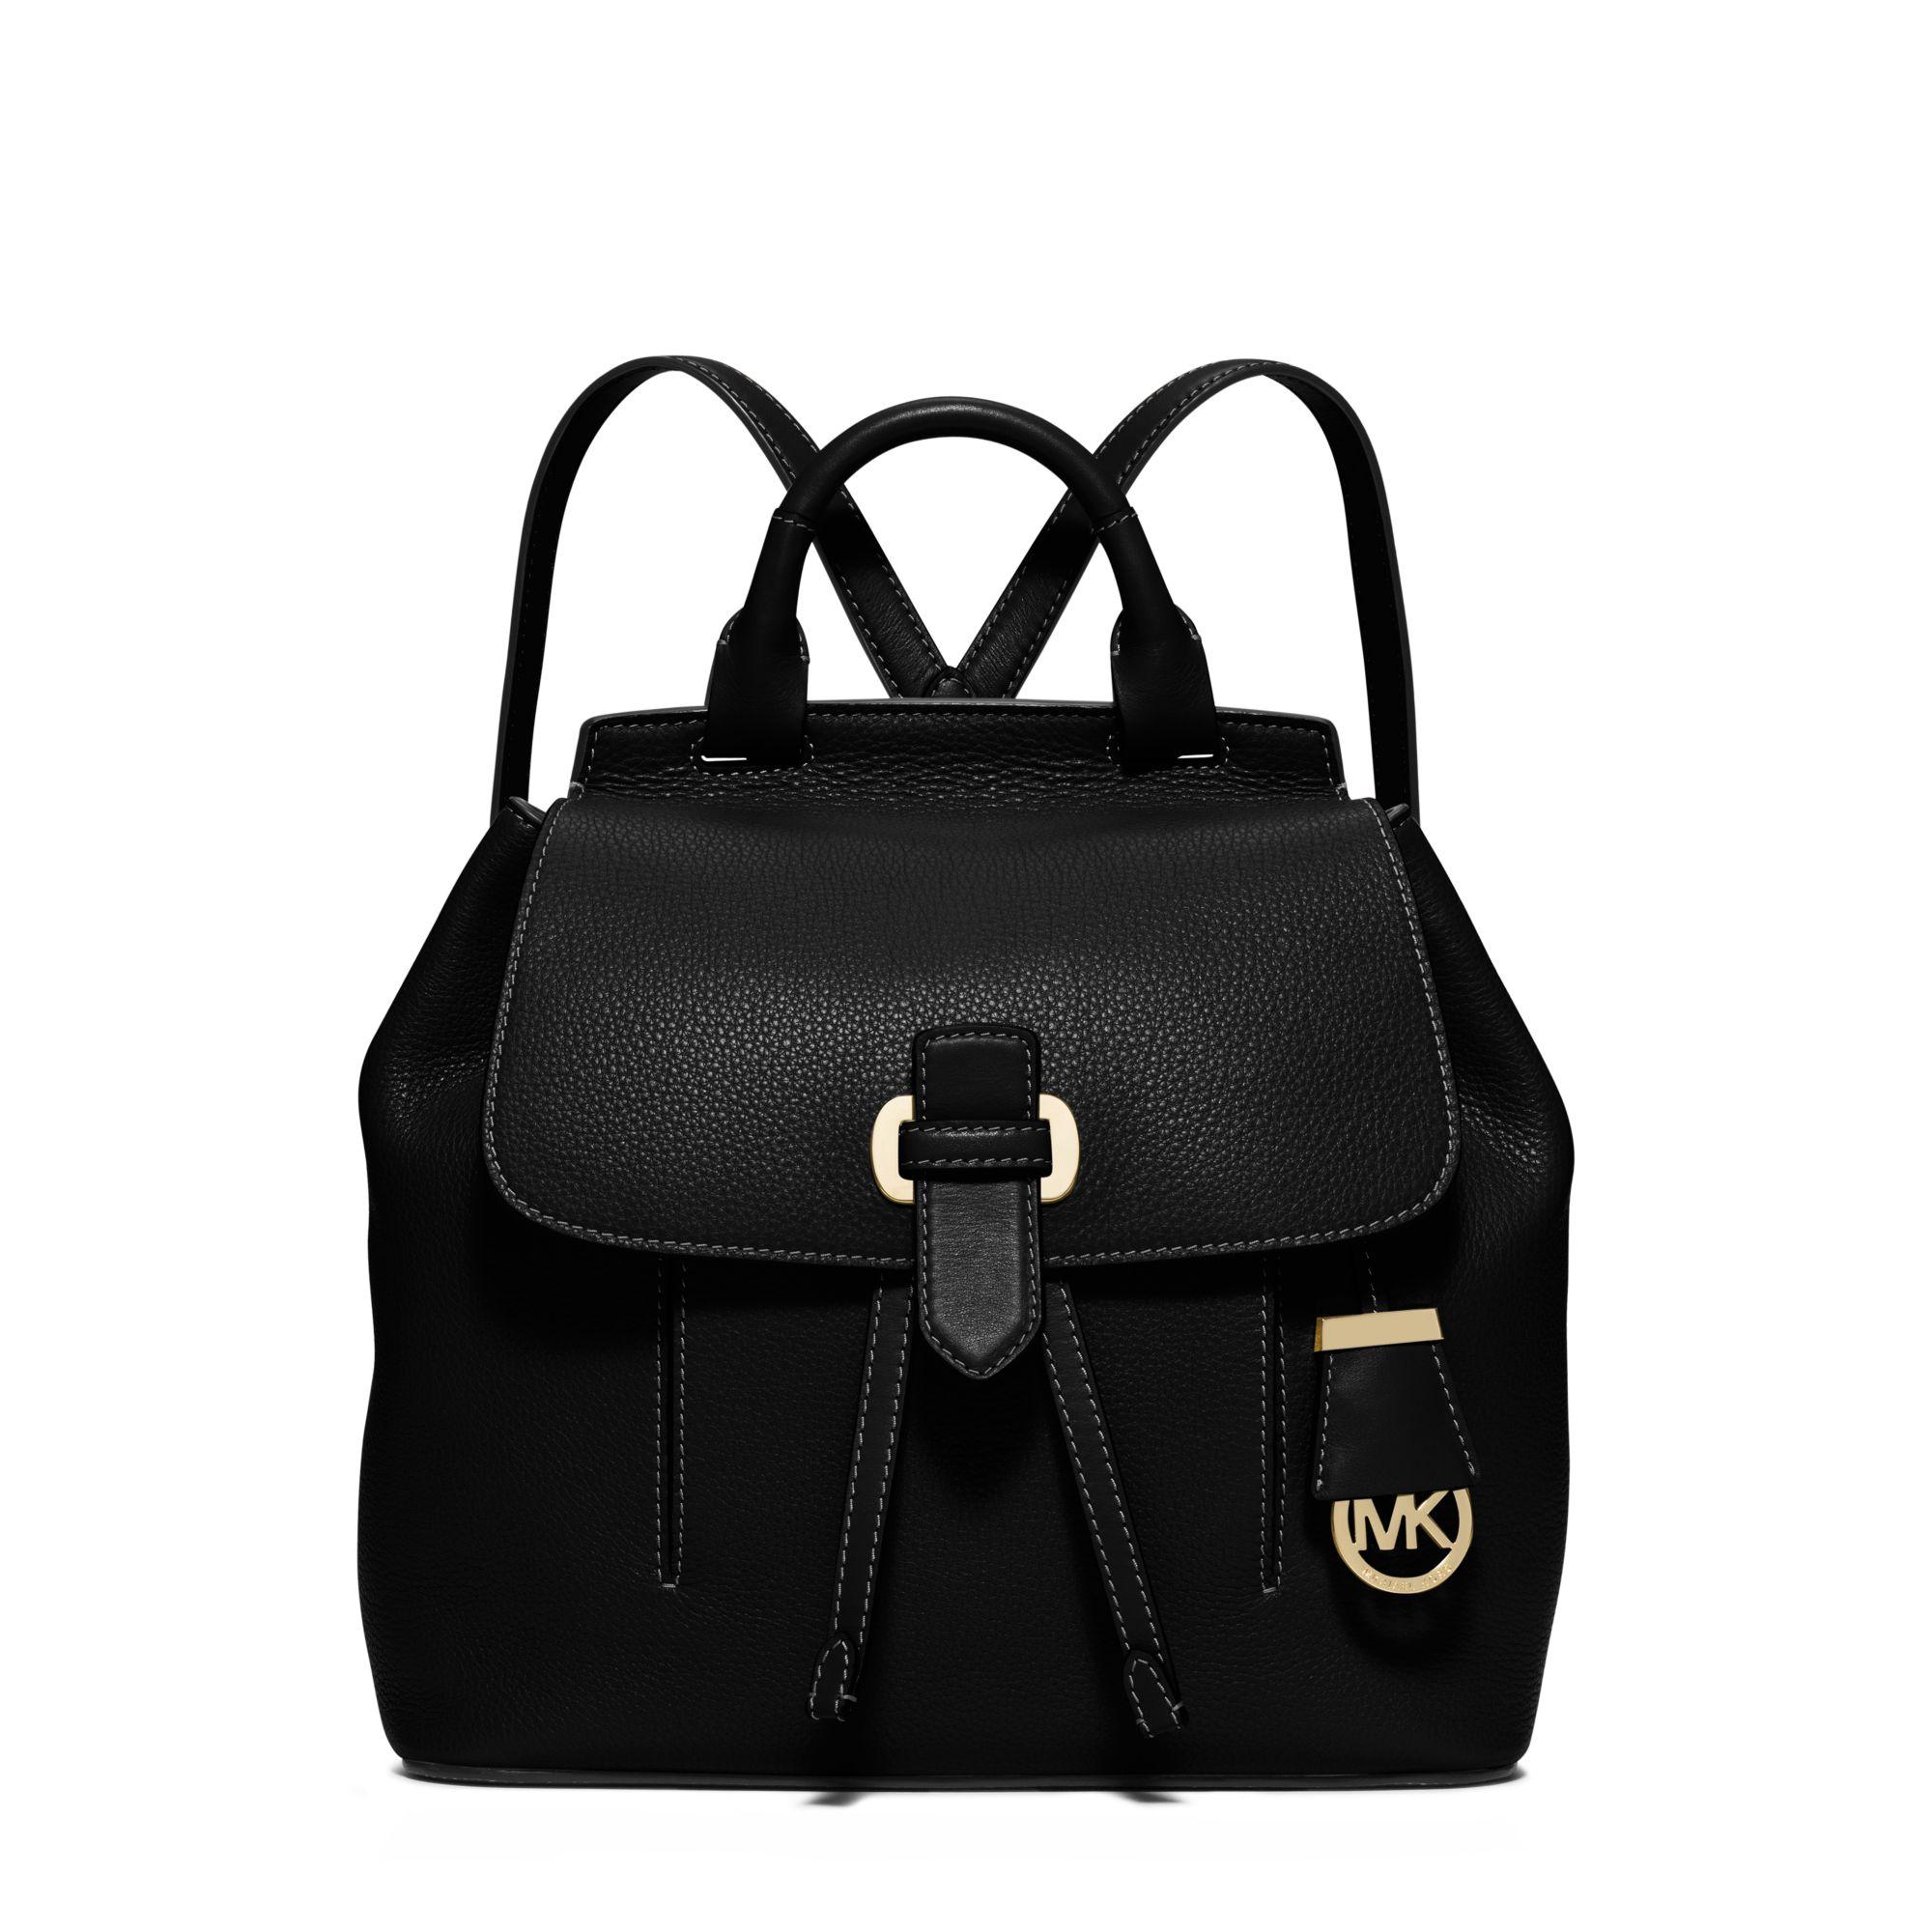 95a37ea12413 Michael Kors Romy Medium Leather Backpack in Black - Lyst